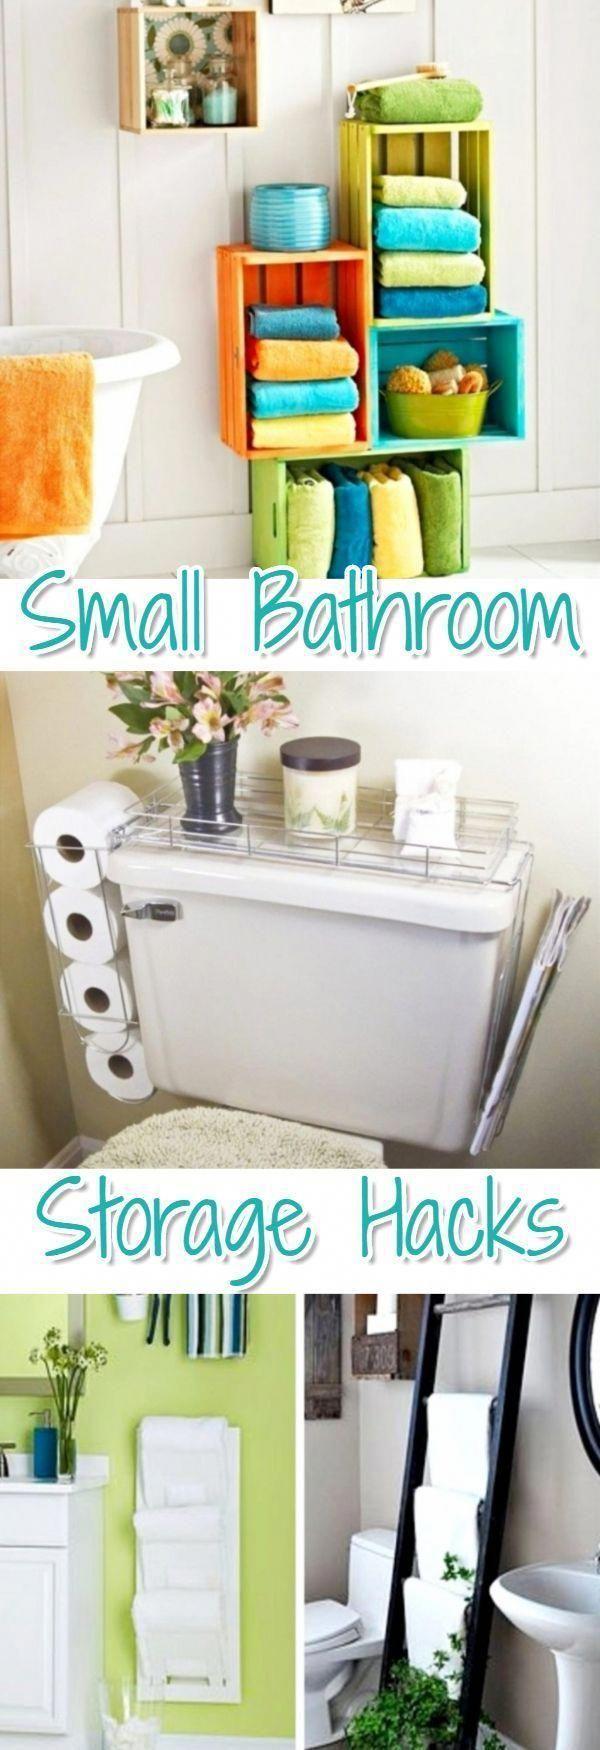 Small Bathroom Storage Solutions Storage Ideas For Small Bedrooms Great Small Bathroom Storage Solutions Small Bathroom Storage Bathroom Storage Solutions